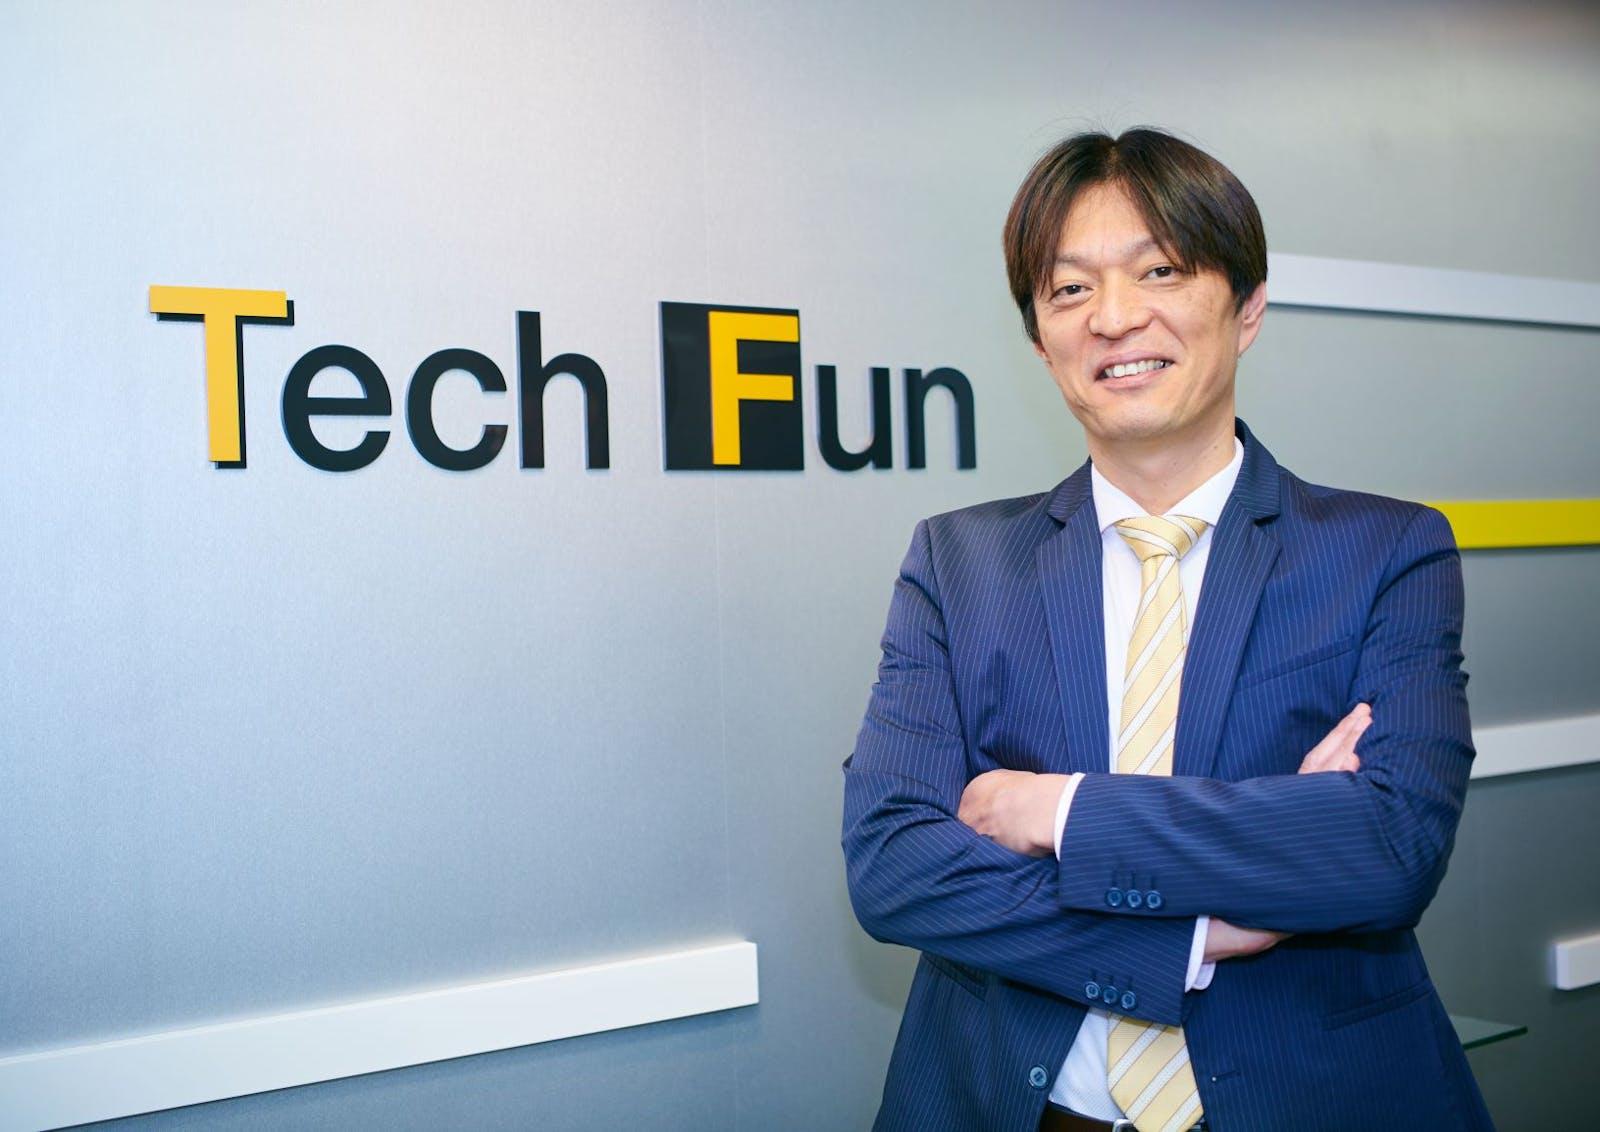 Tech Fun株式会社のアイキャッチ画像